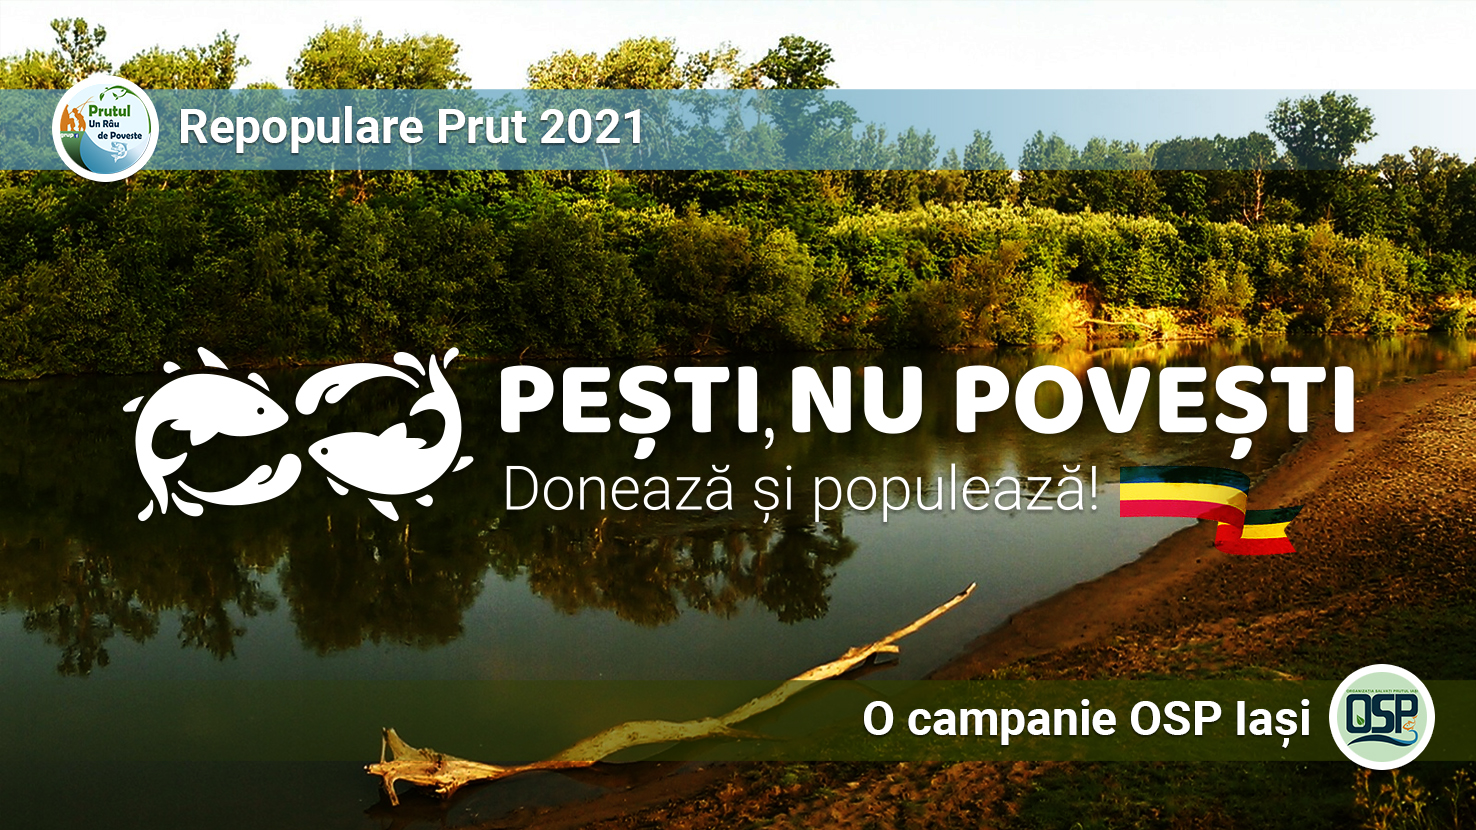 repopulare prut 2021